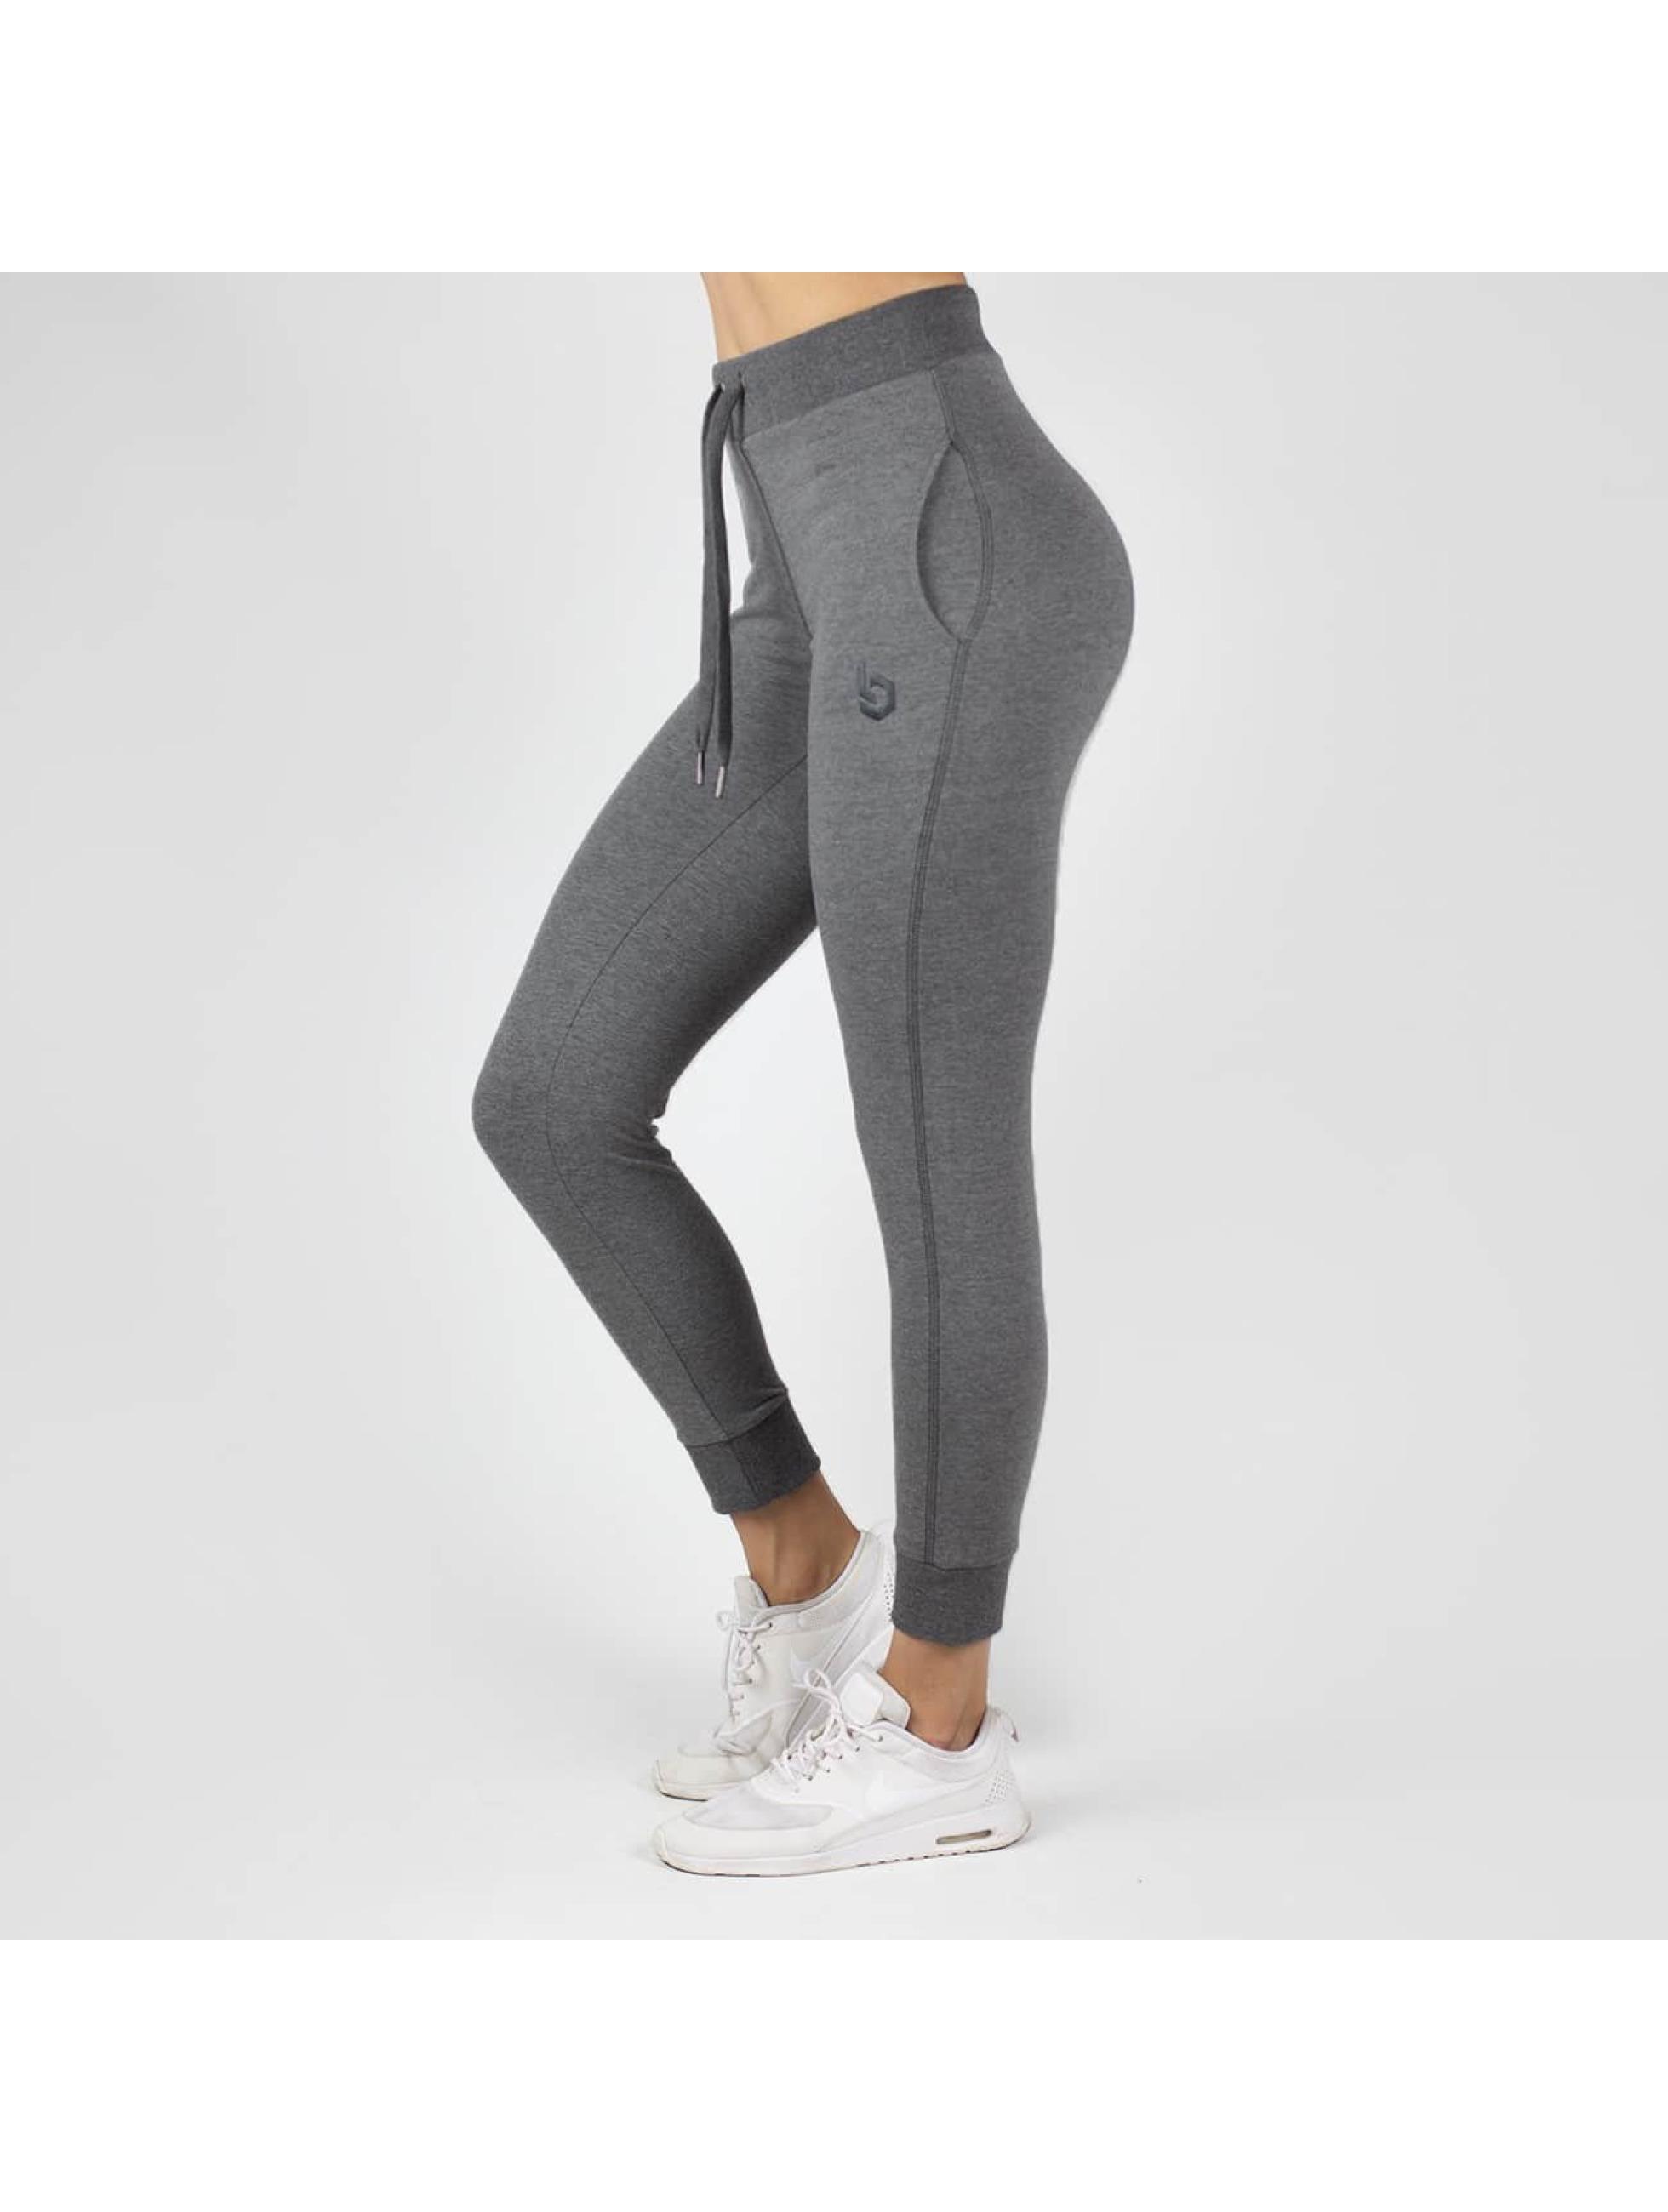 Beyond Limits Legging Motion gris